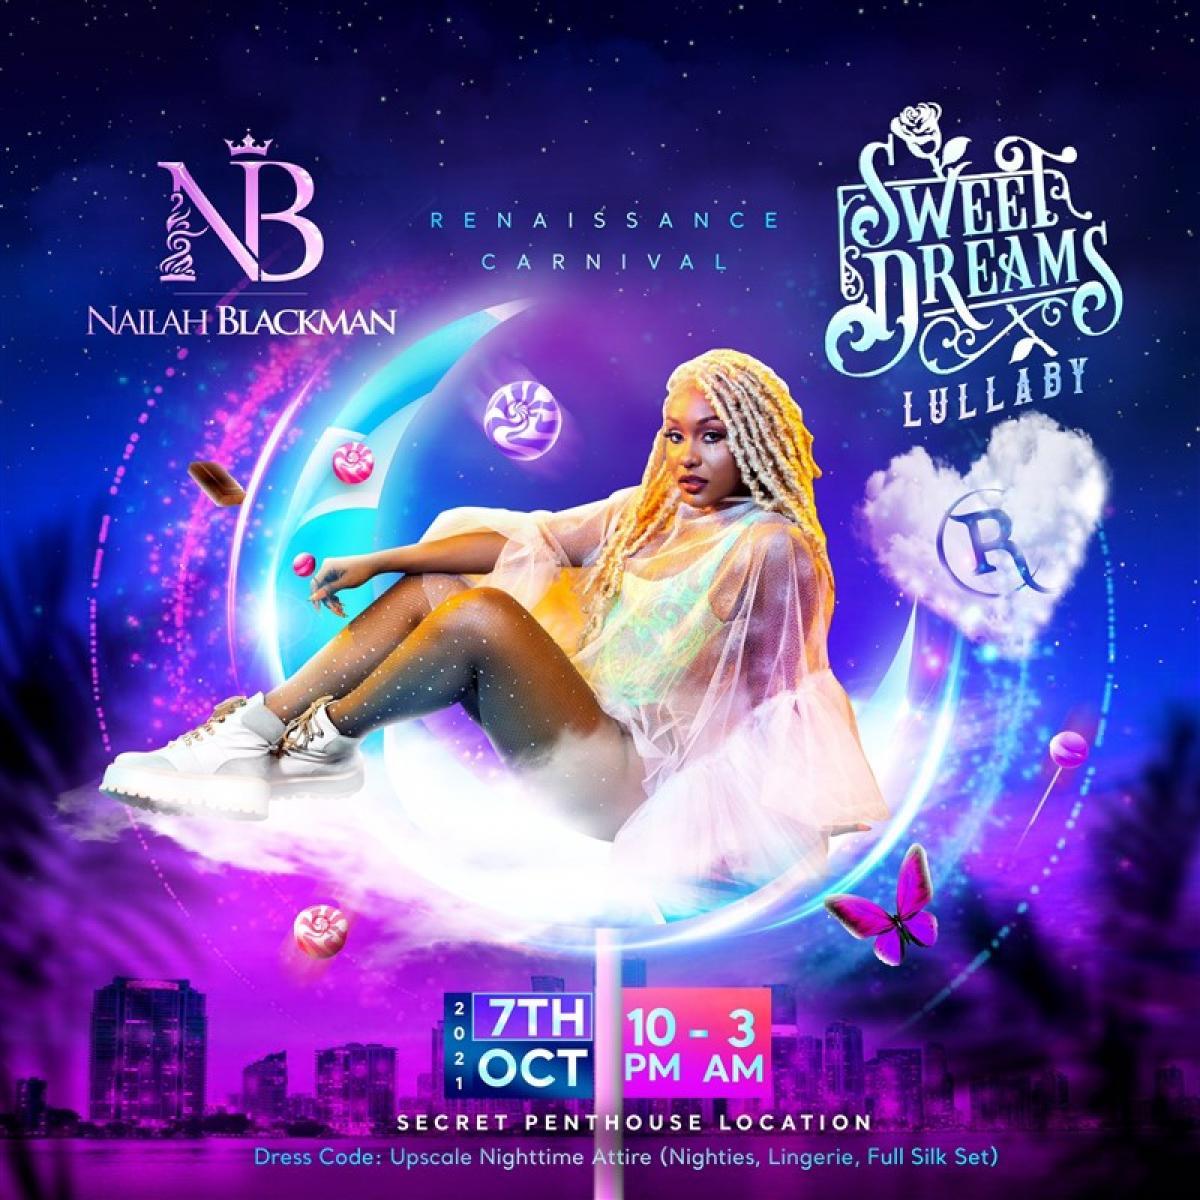 Sweet Dreams Miami flyer or graphic.